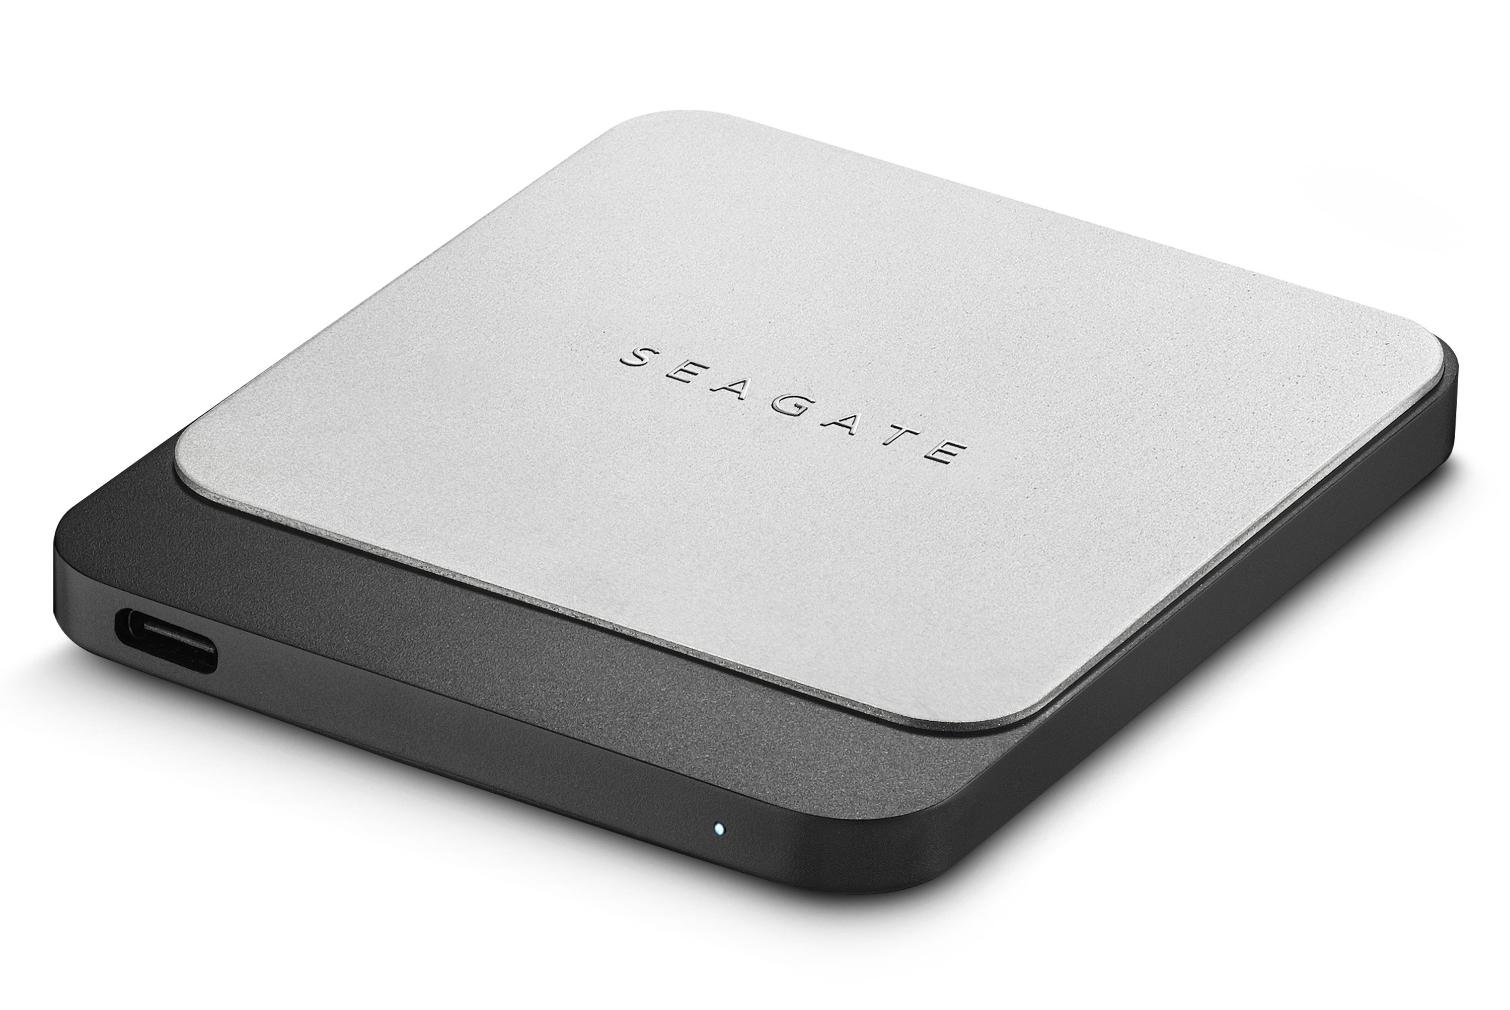 Drive SSD externo Seagate Fast SSD